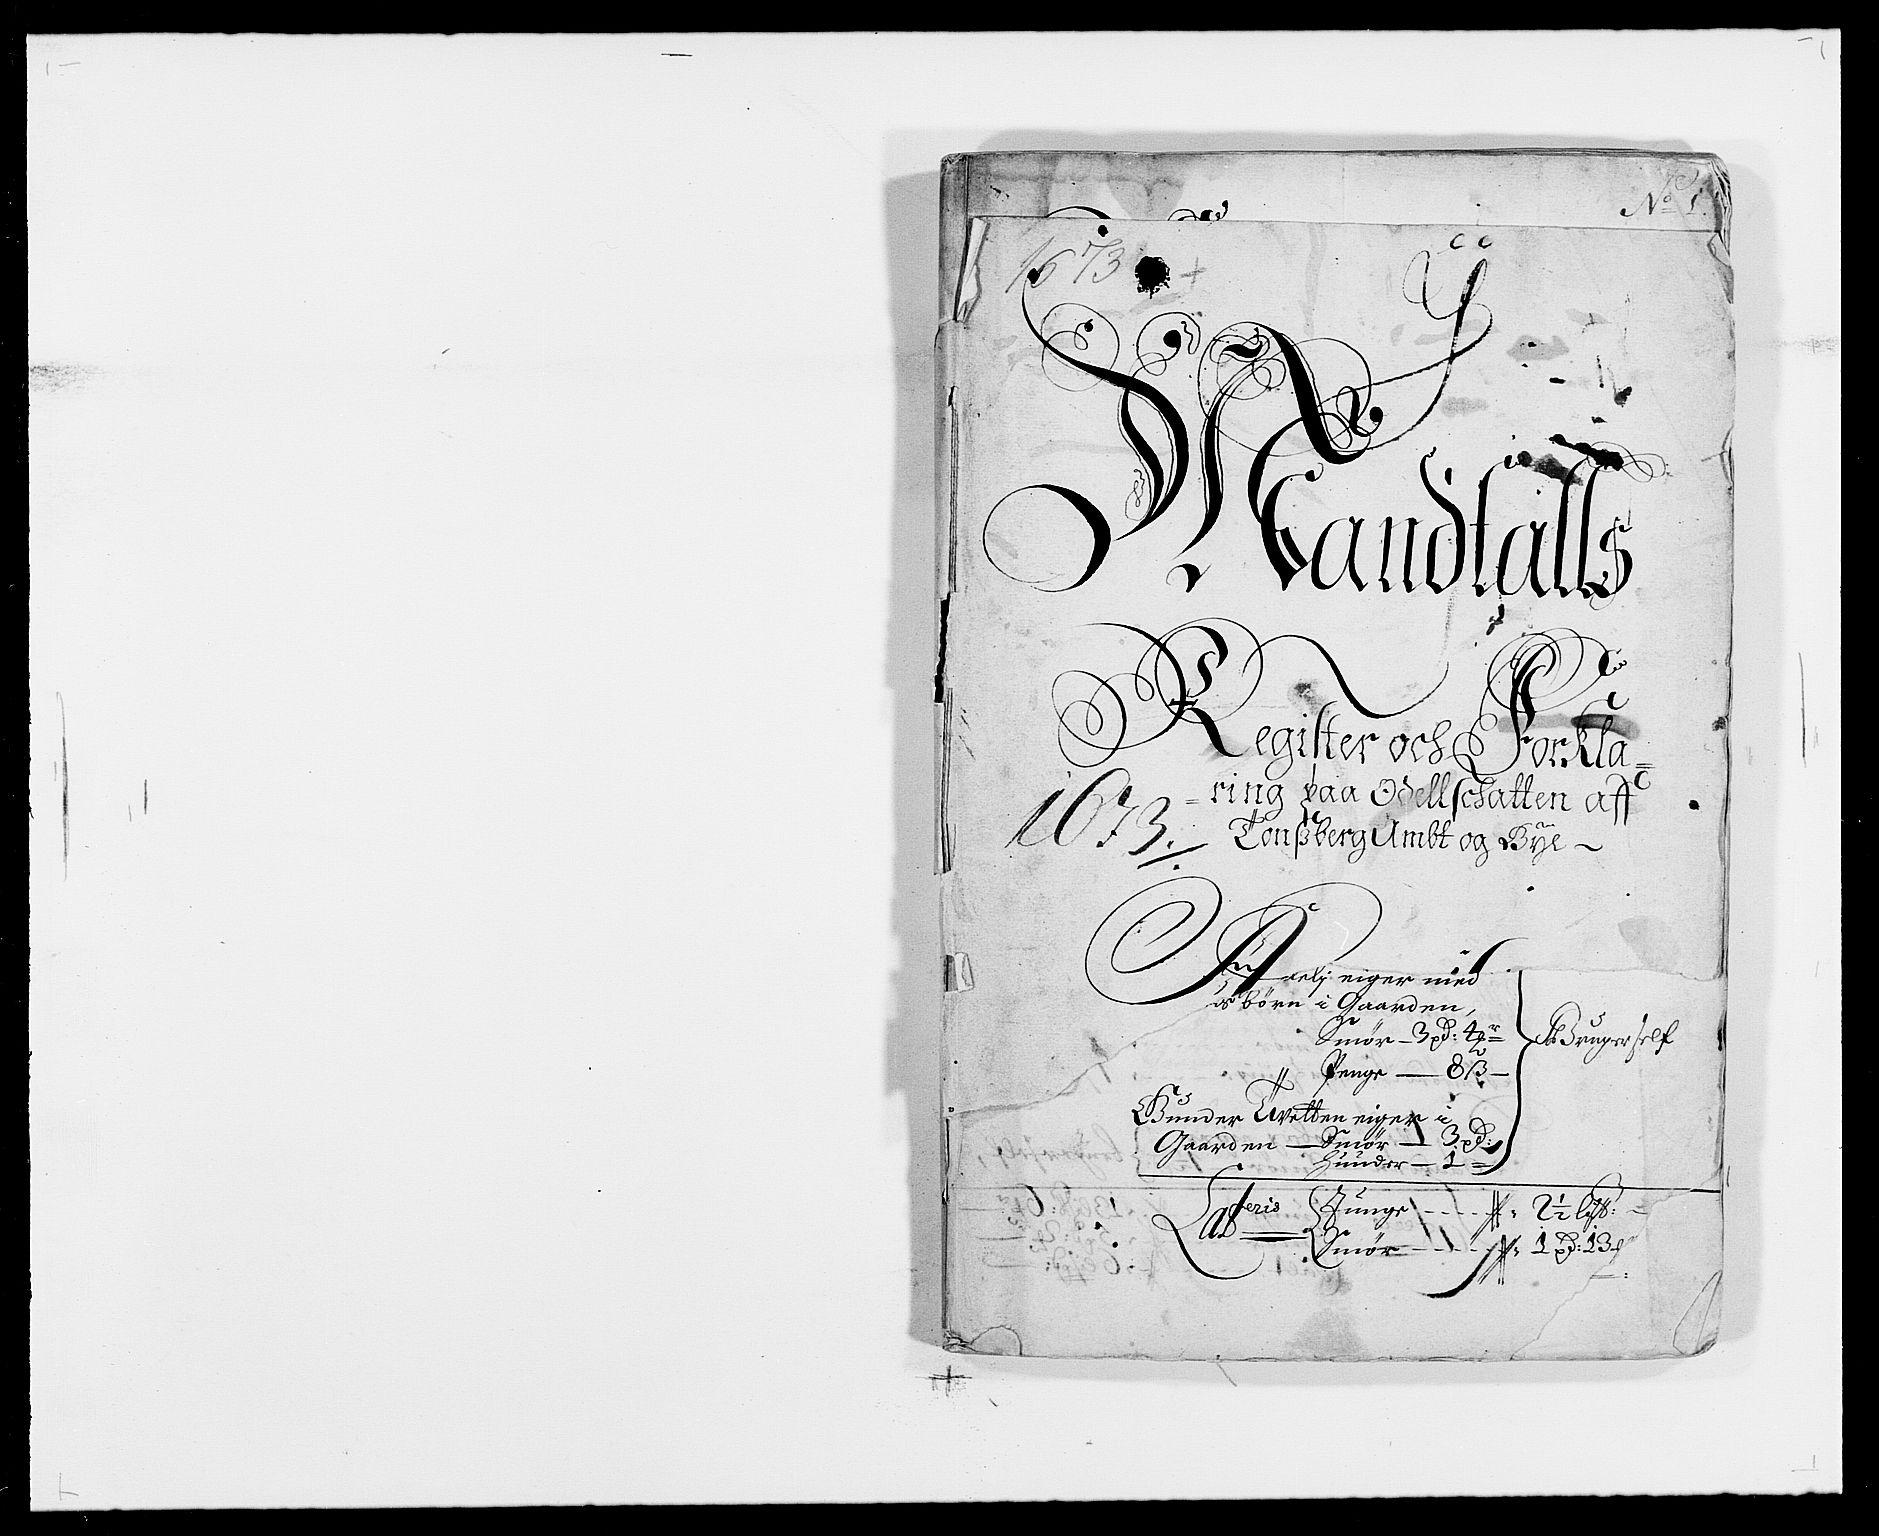 RA, Rentekammeret inntil 1814, Reviderte regnskaper, Fogderegnskap, R32/L1841: Fogderegnskap Jarlsberg grevskap, 1664-1673, s. 285